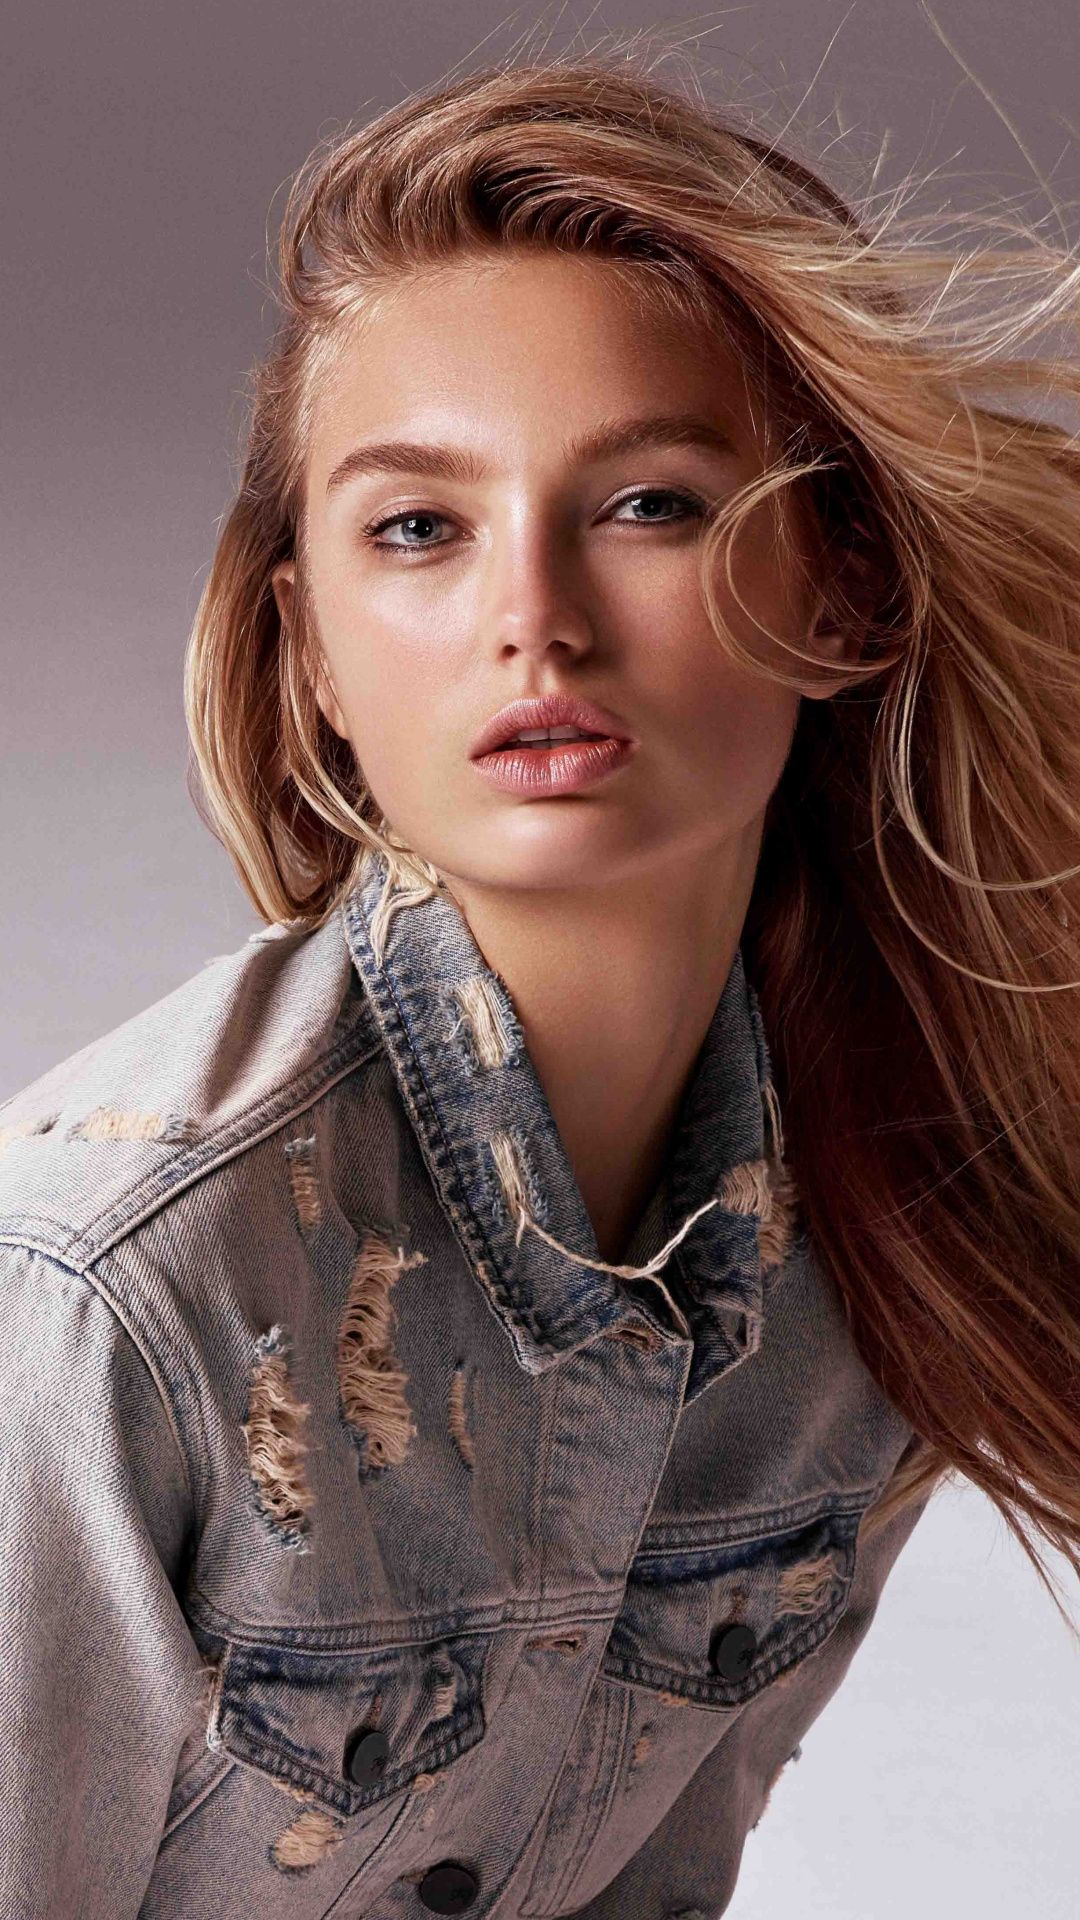 Celebrity Brunette Gorgeous Romee Strijd 1080x1920 Wallpaper